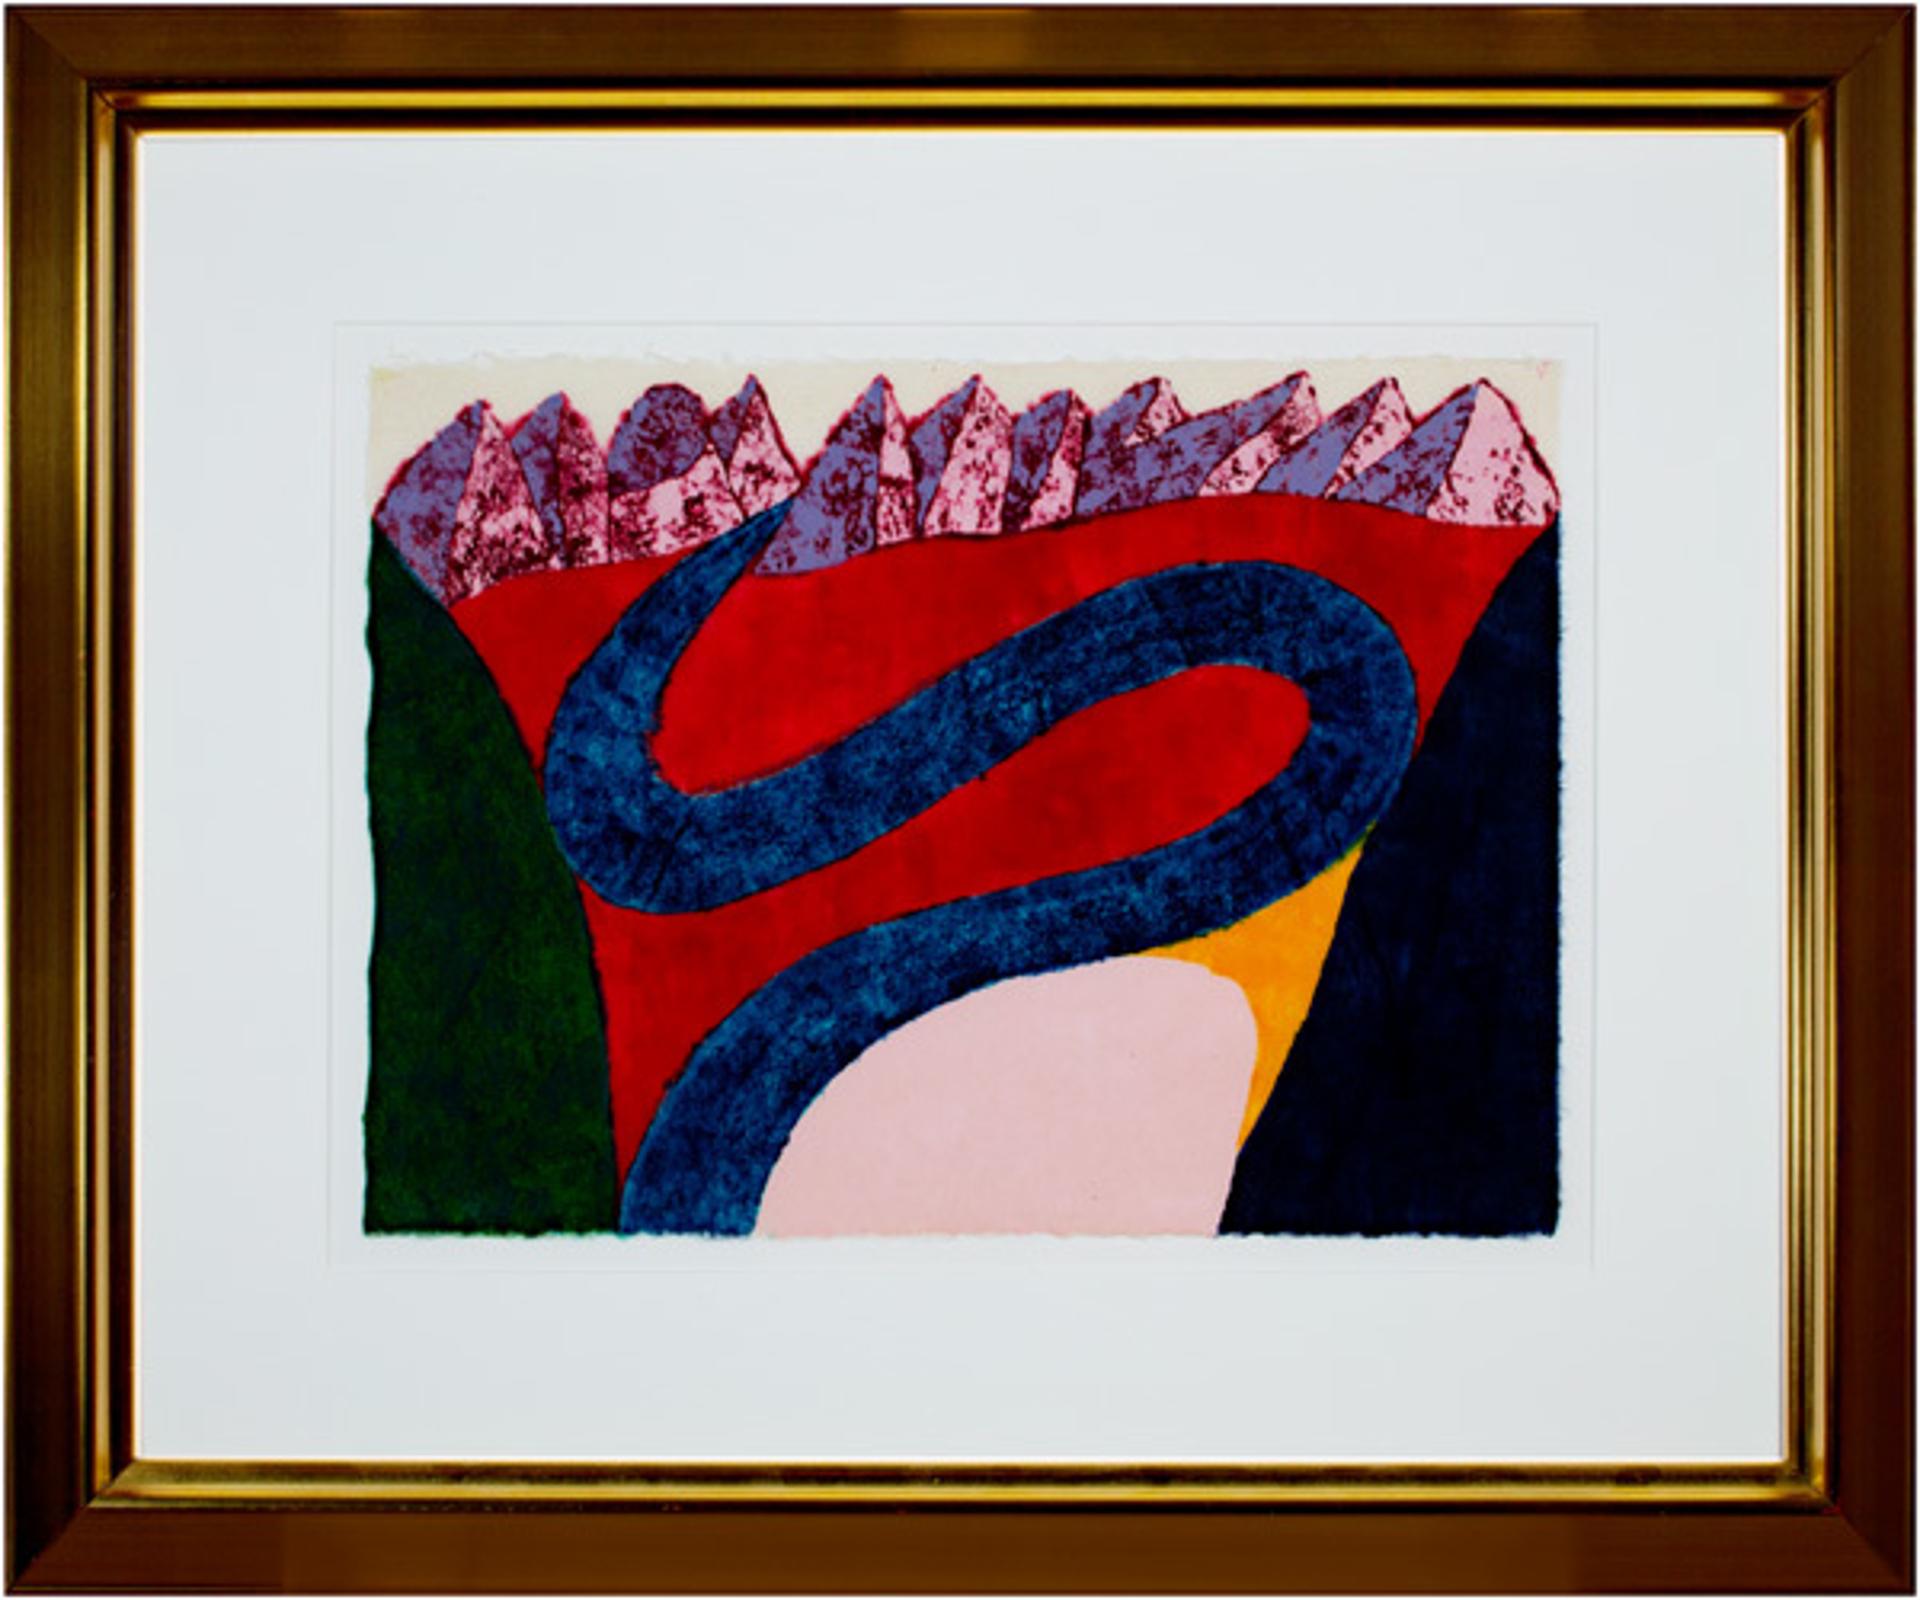 Dudh Kosi (Milk River) by Carol Summers